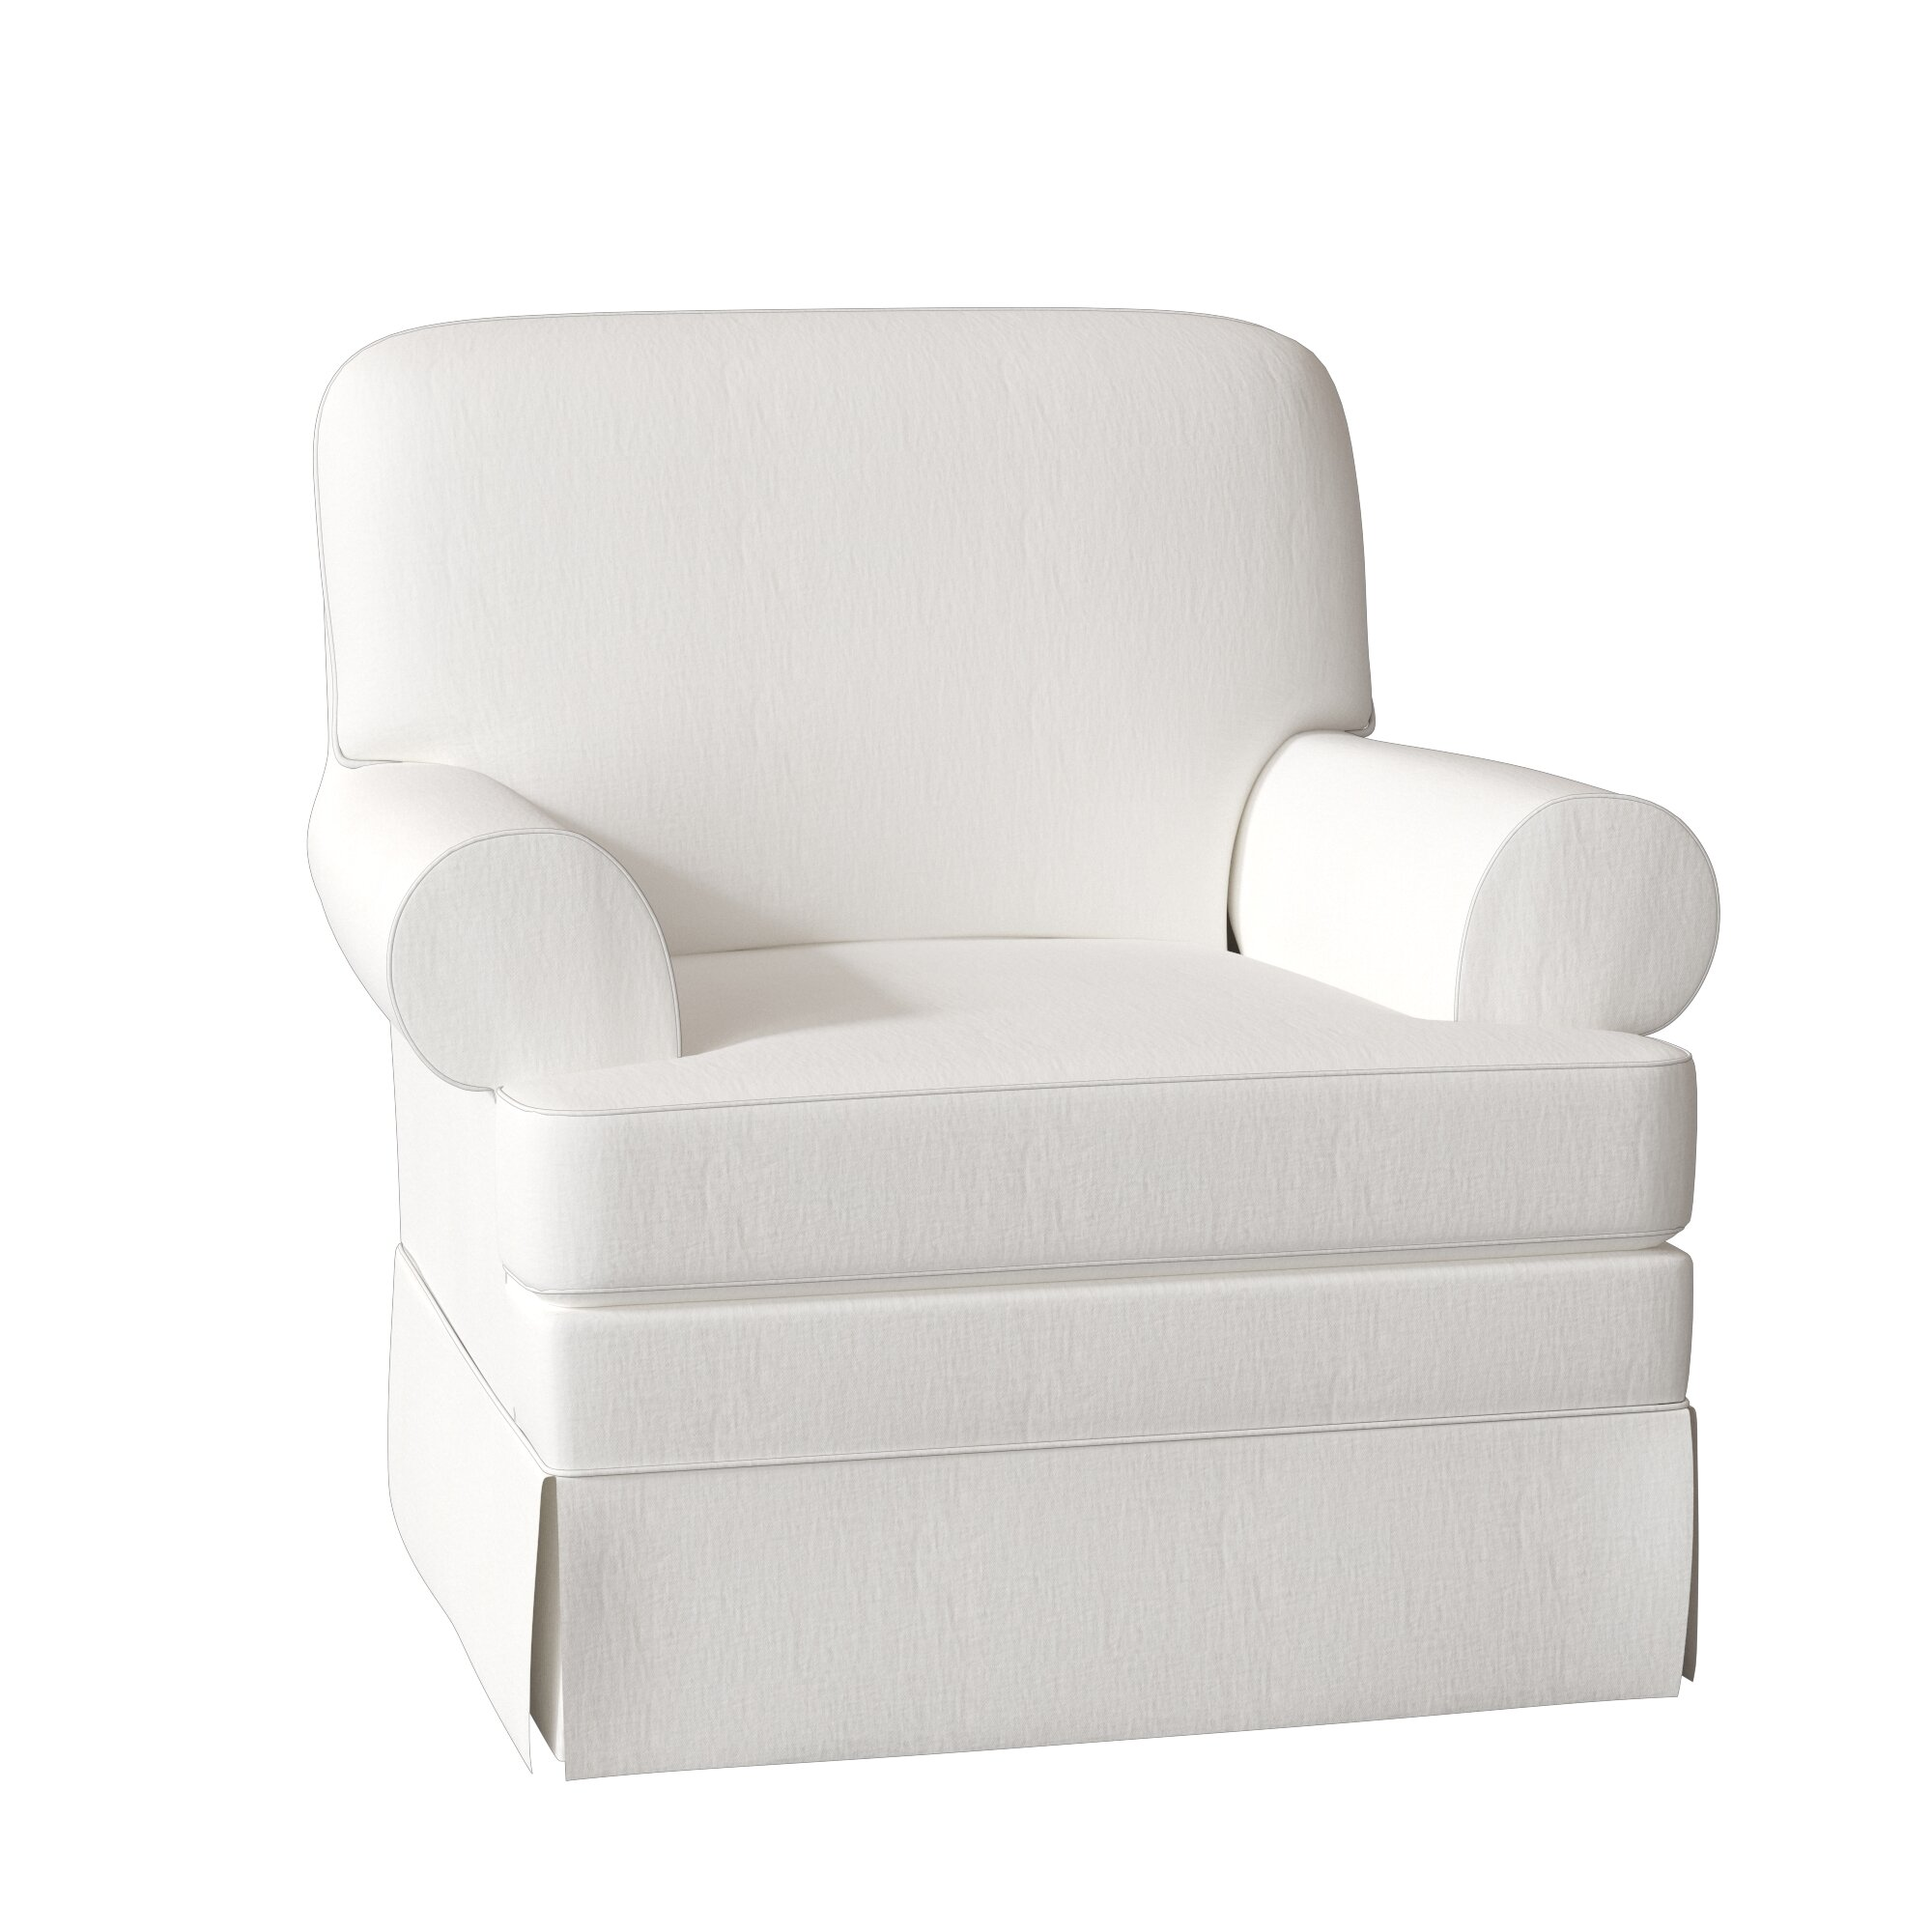 Remarkable Hailey Swivel Glider Lamtechconsult Wood Chair Design Ideas Lamtechconsultcom